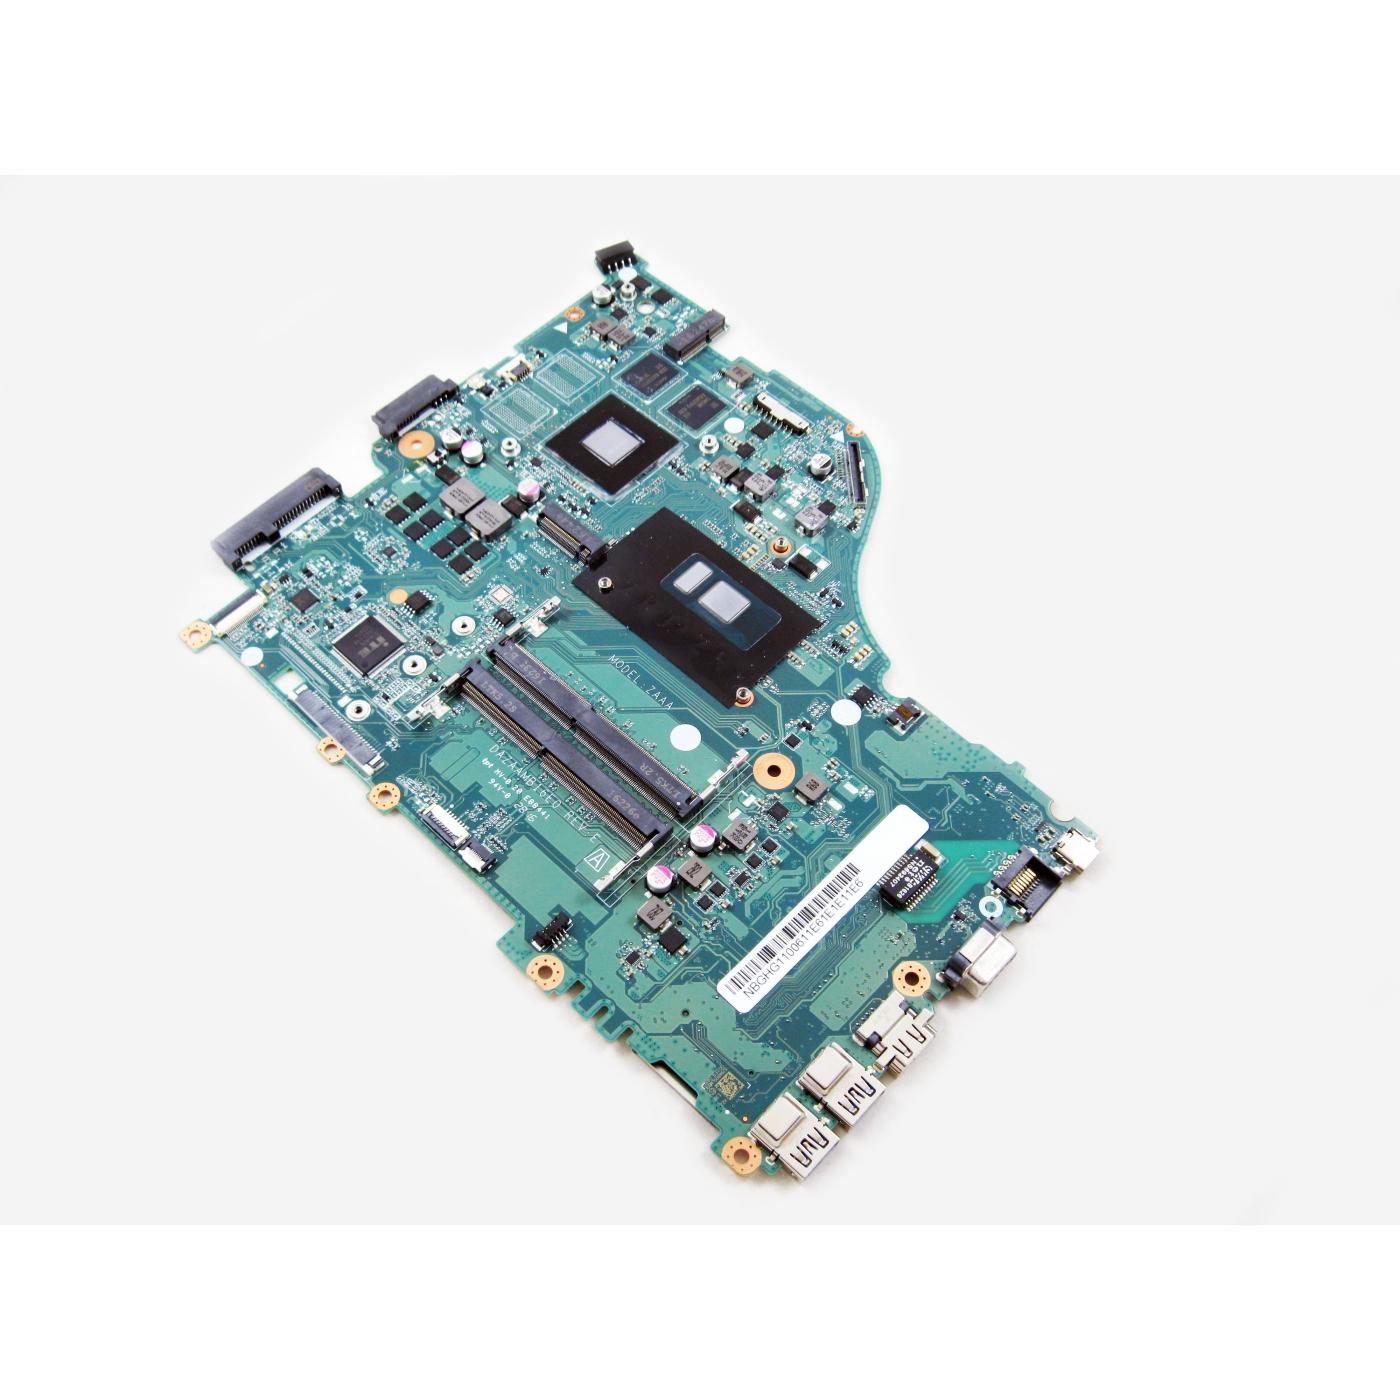 Acer NB.GHG11.006 Aspire E5-575G F5-573G I7-6500U Dis 940M Notebook Motherboard